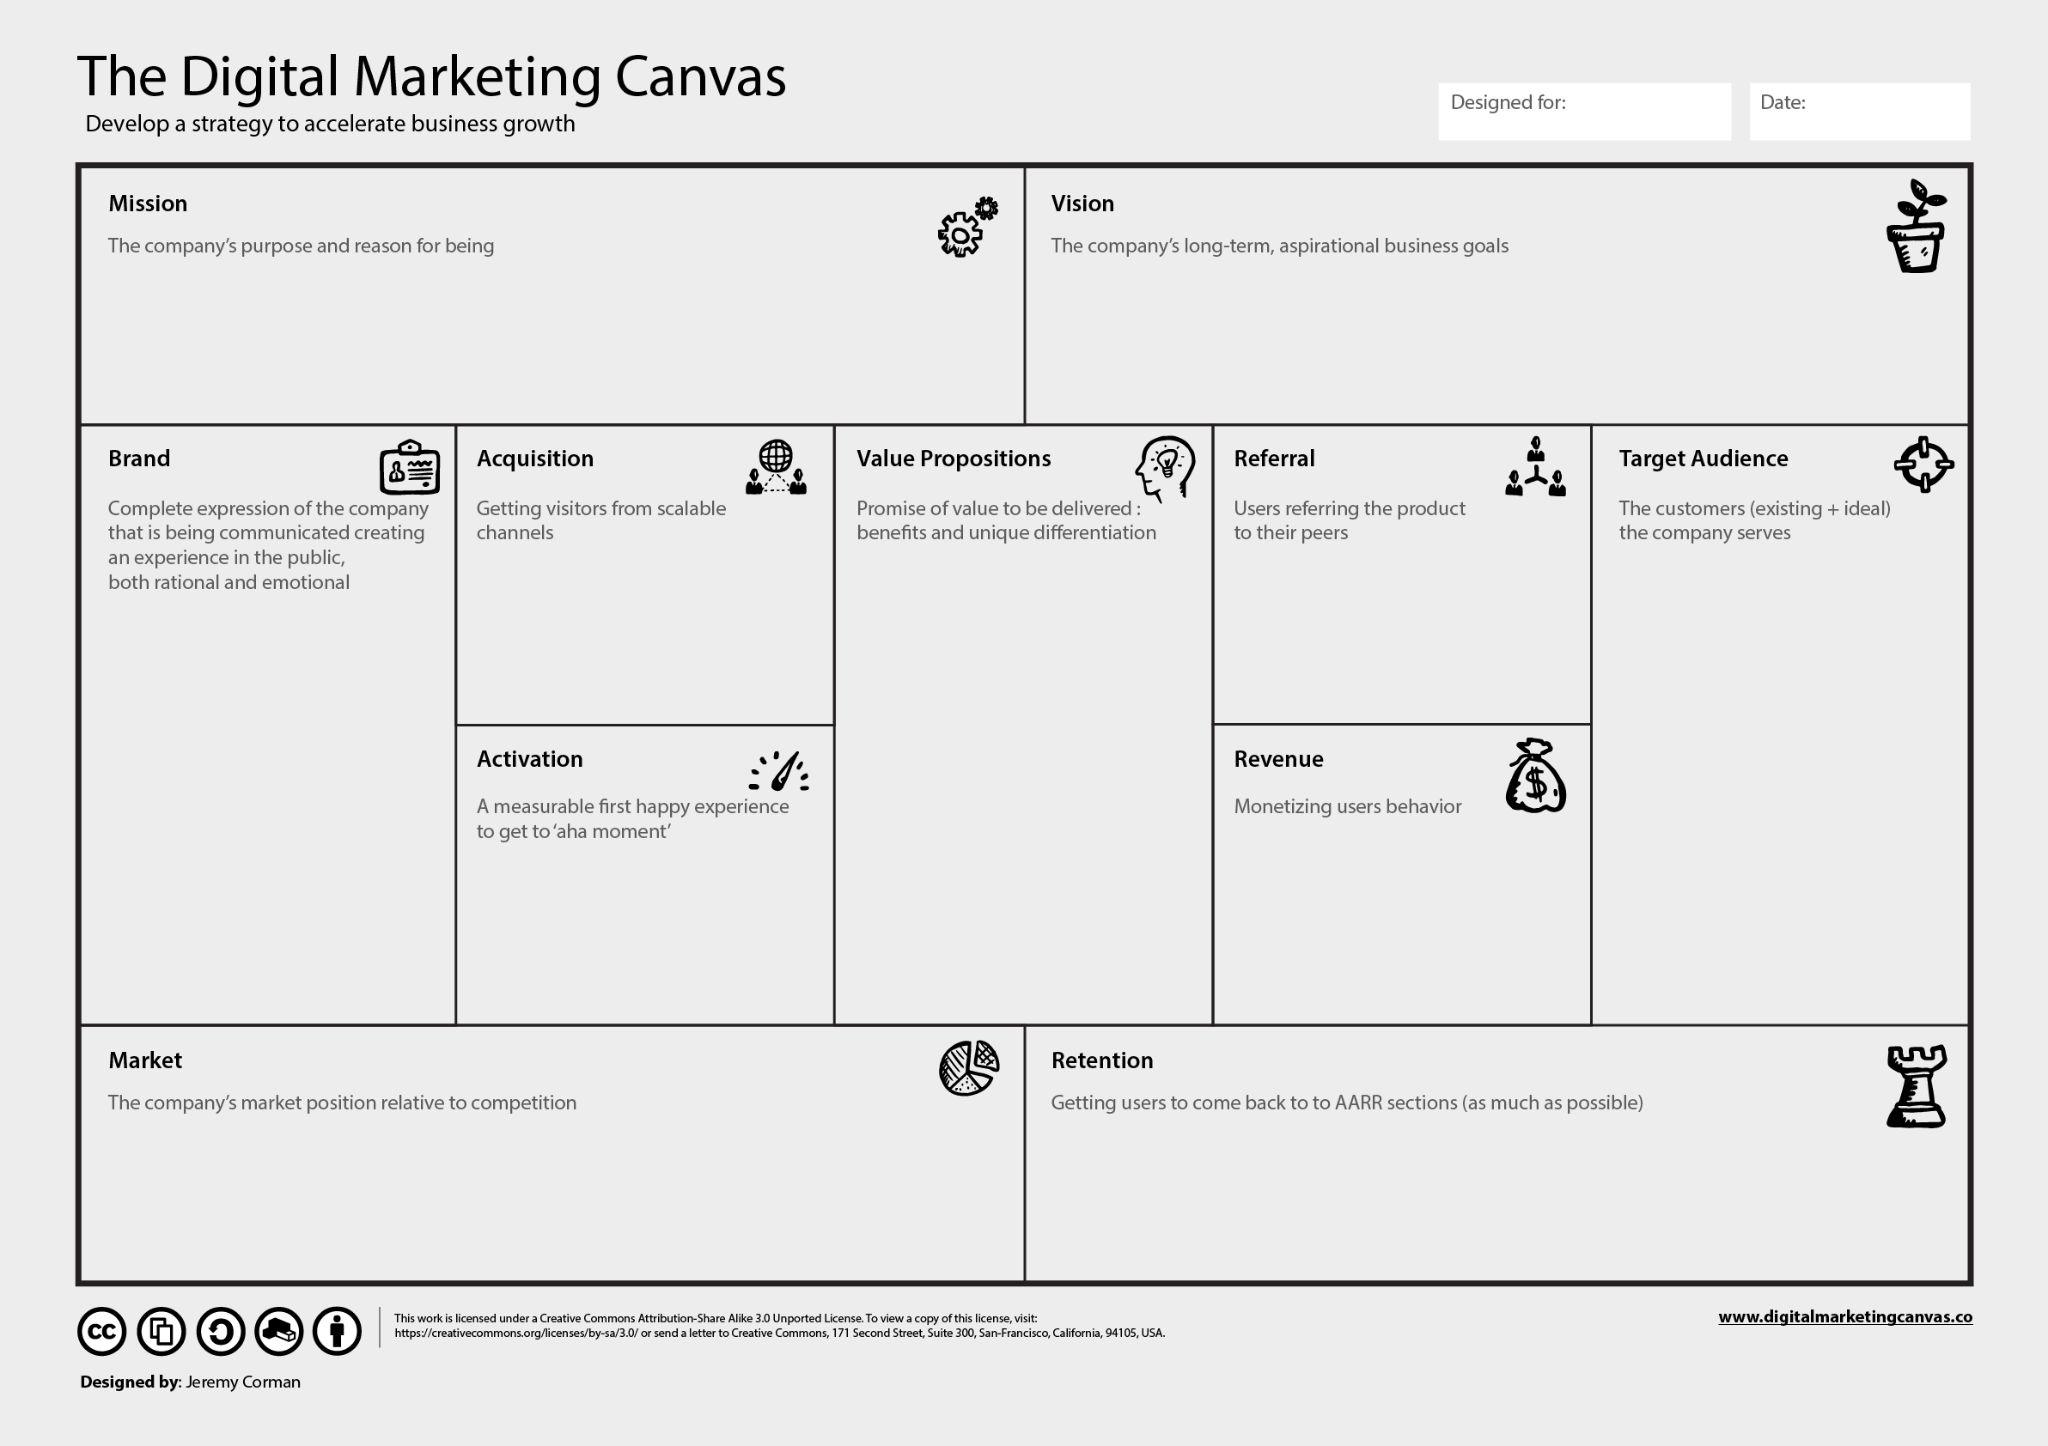 Digital-Marketing-Canvas_English-DMC.png